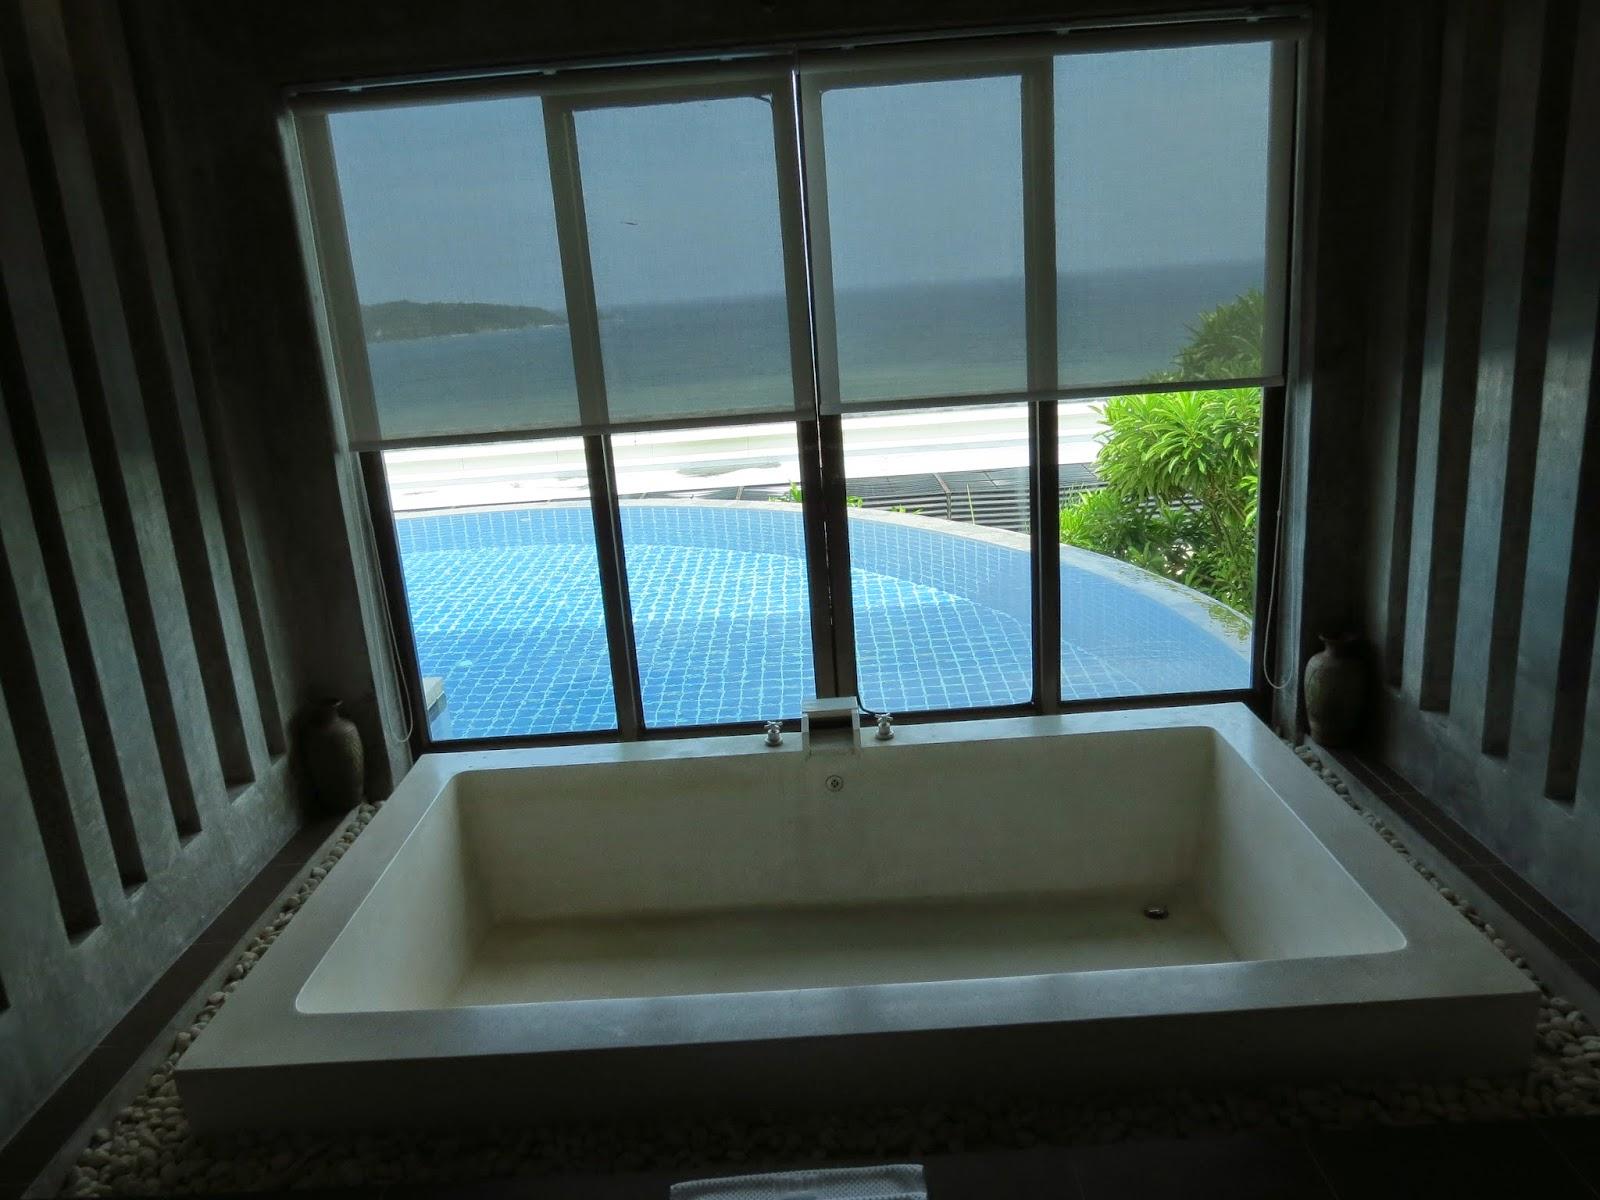 Biggest Bathtub. Stunning Not Forgetting The Enormous Bathtub That ...